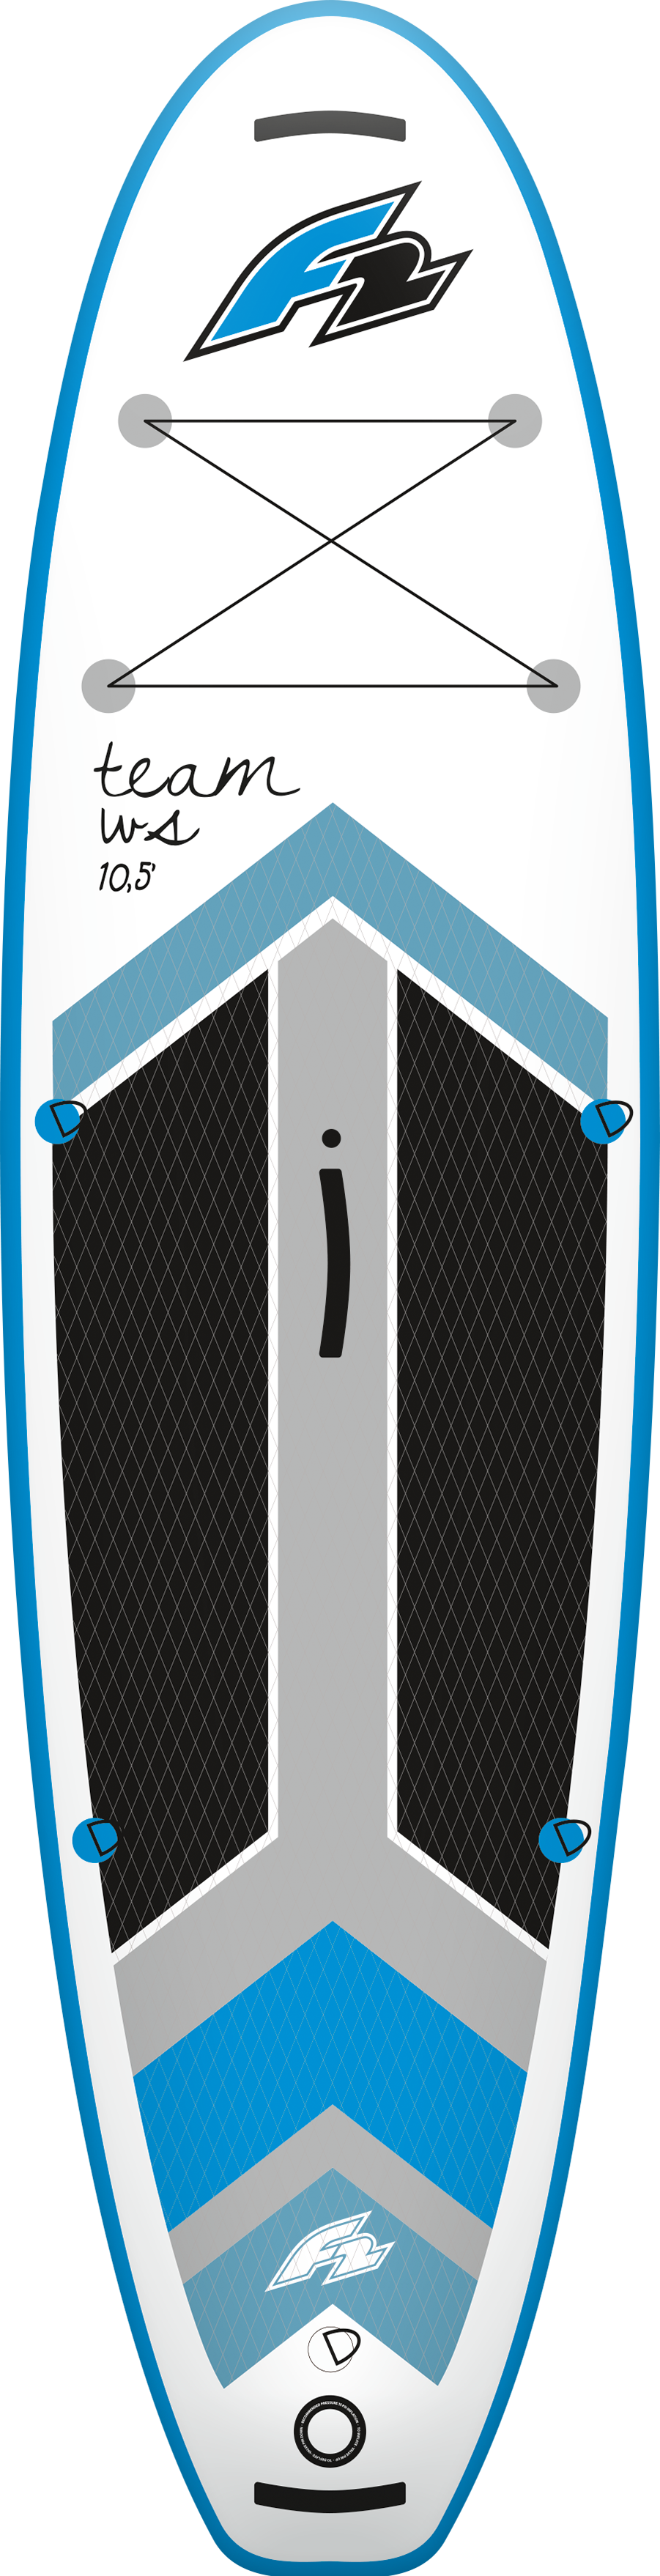 TEAM WINDSURF - Top